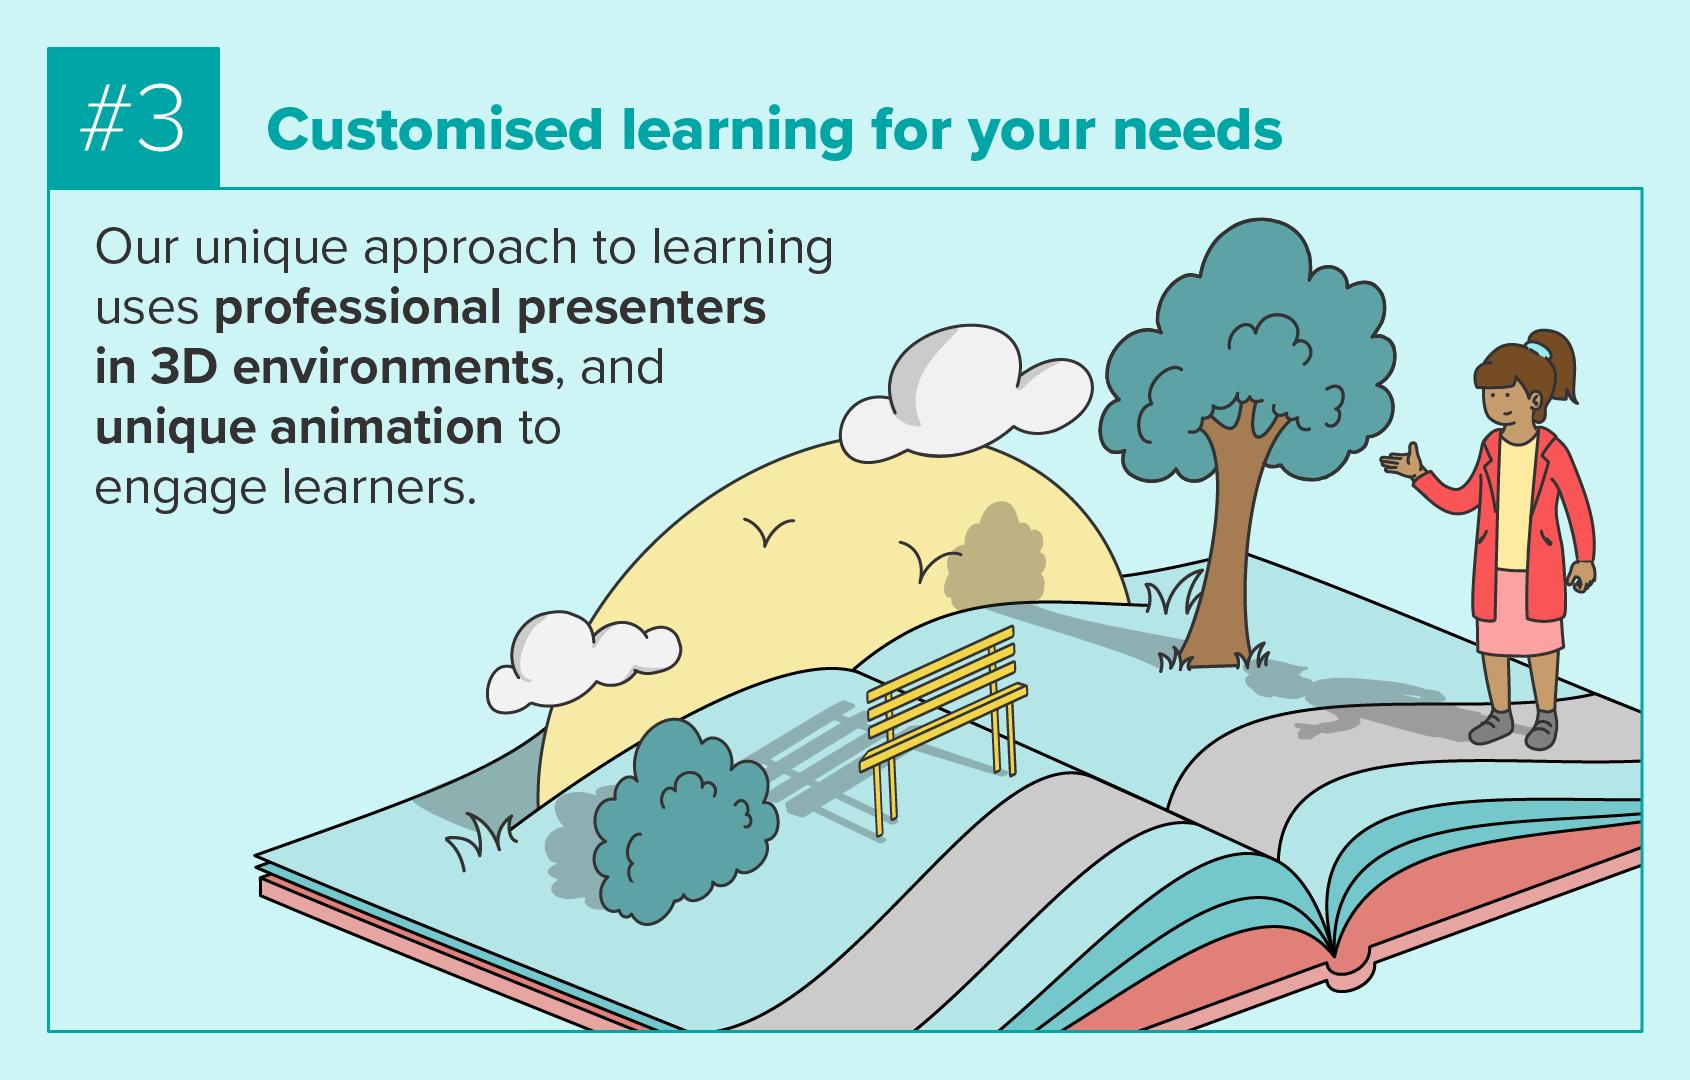 Customised learning